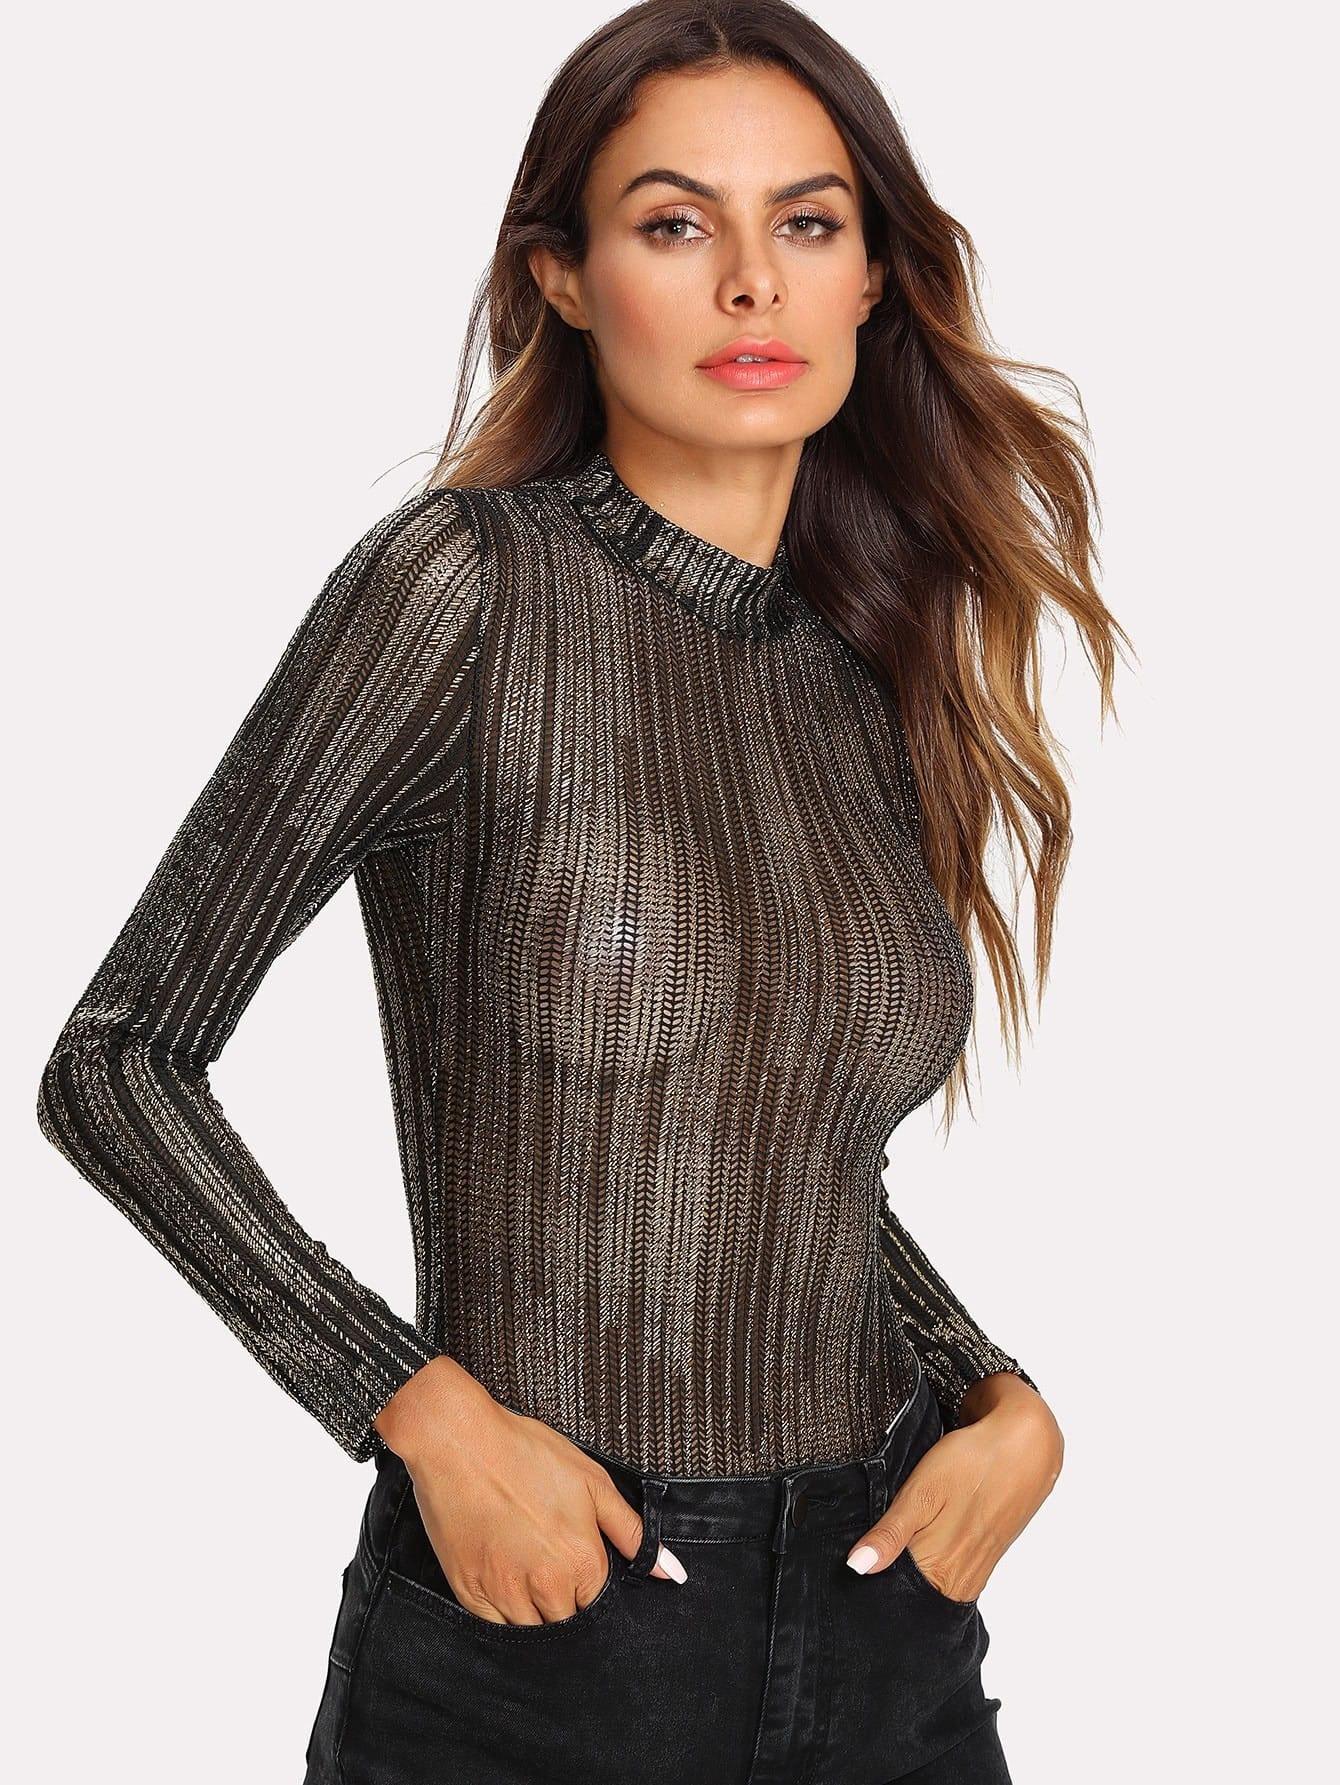 Stand Collar Metallic Bodysuit stand collar metallic bodysuit